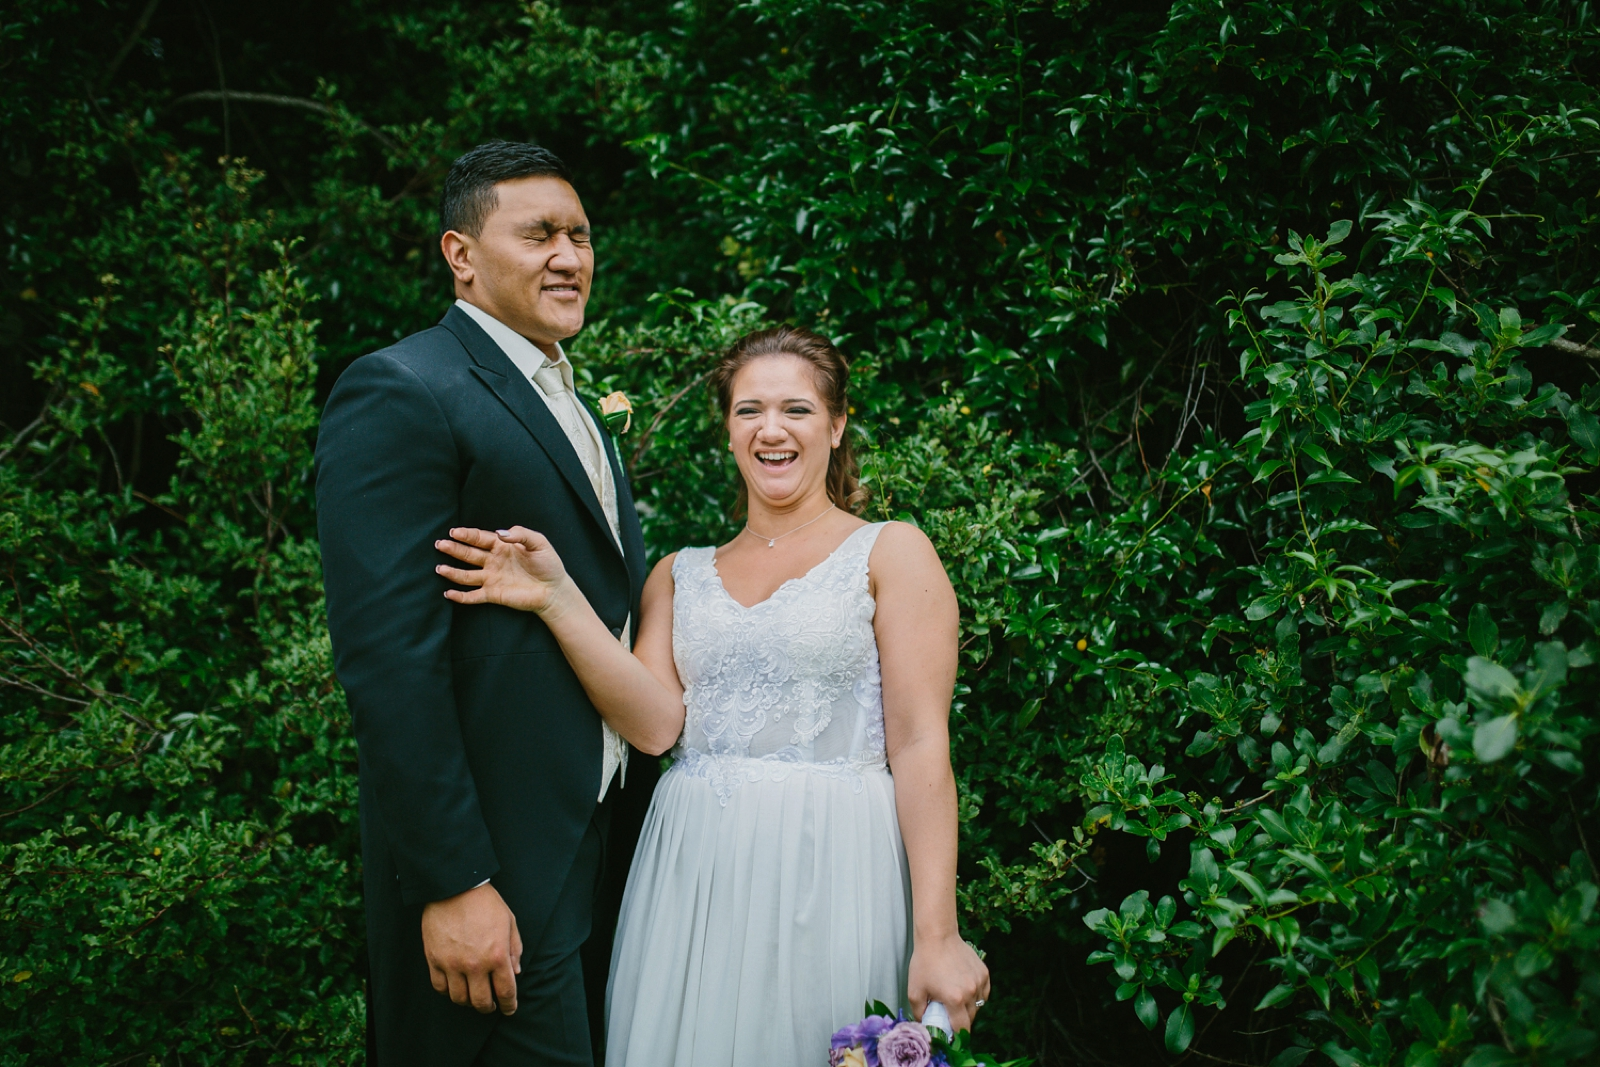 GabbyFiti_Auckland Wedding Photographer_Patty Lagera_0073.jpg